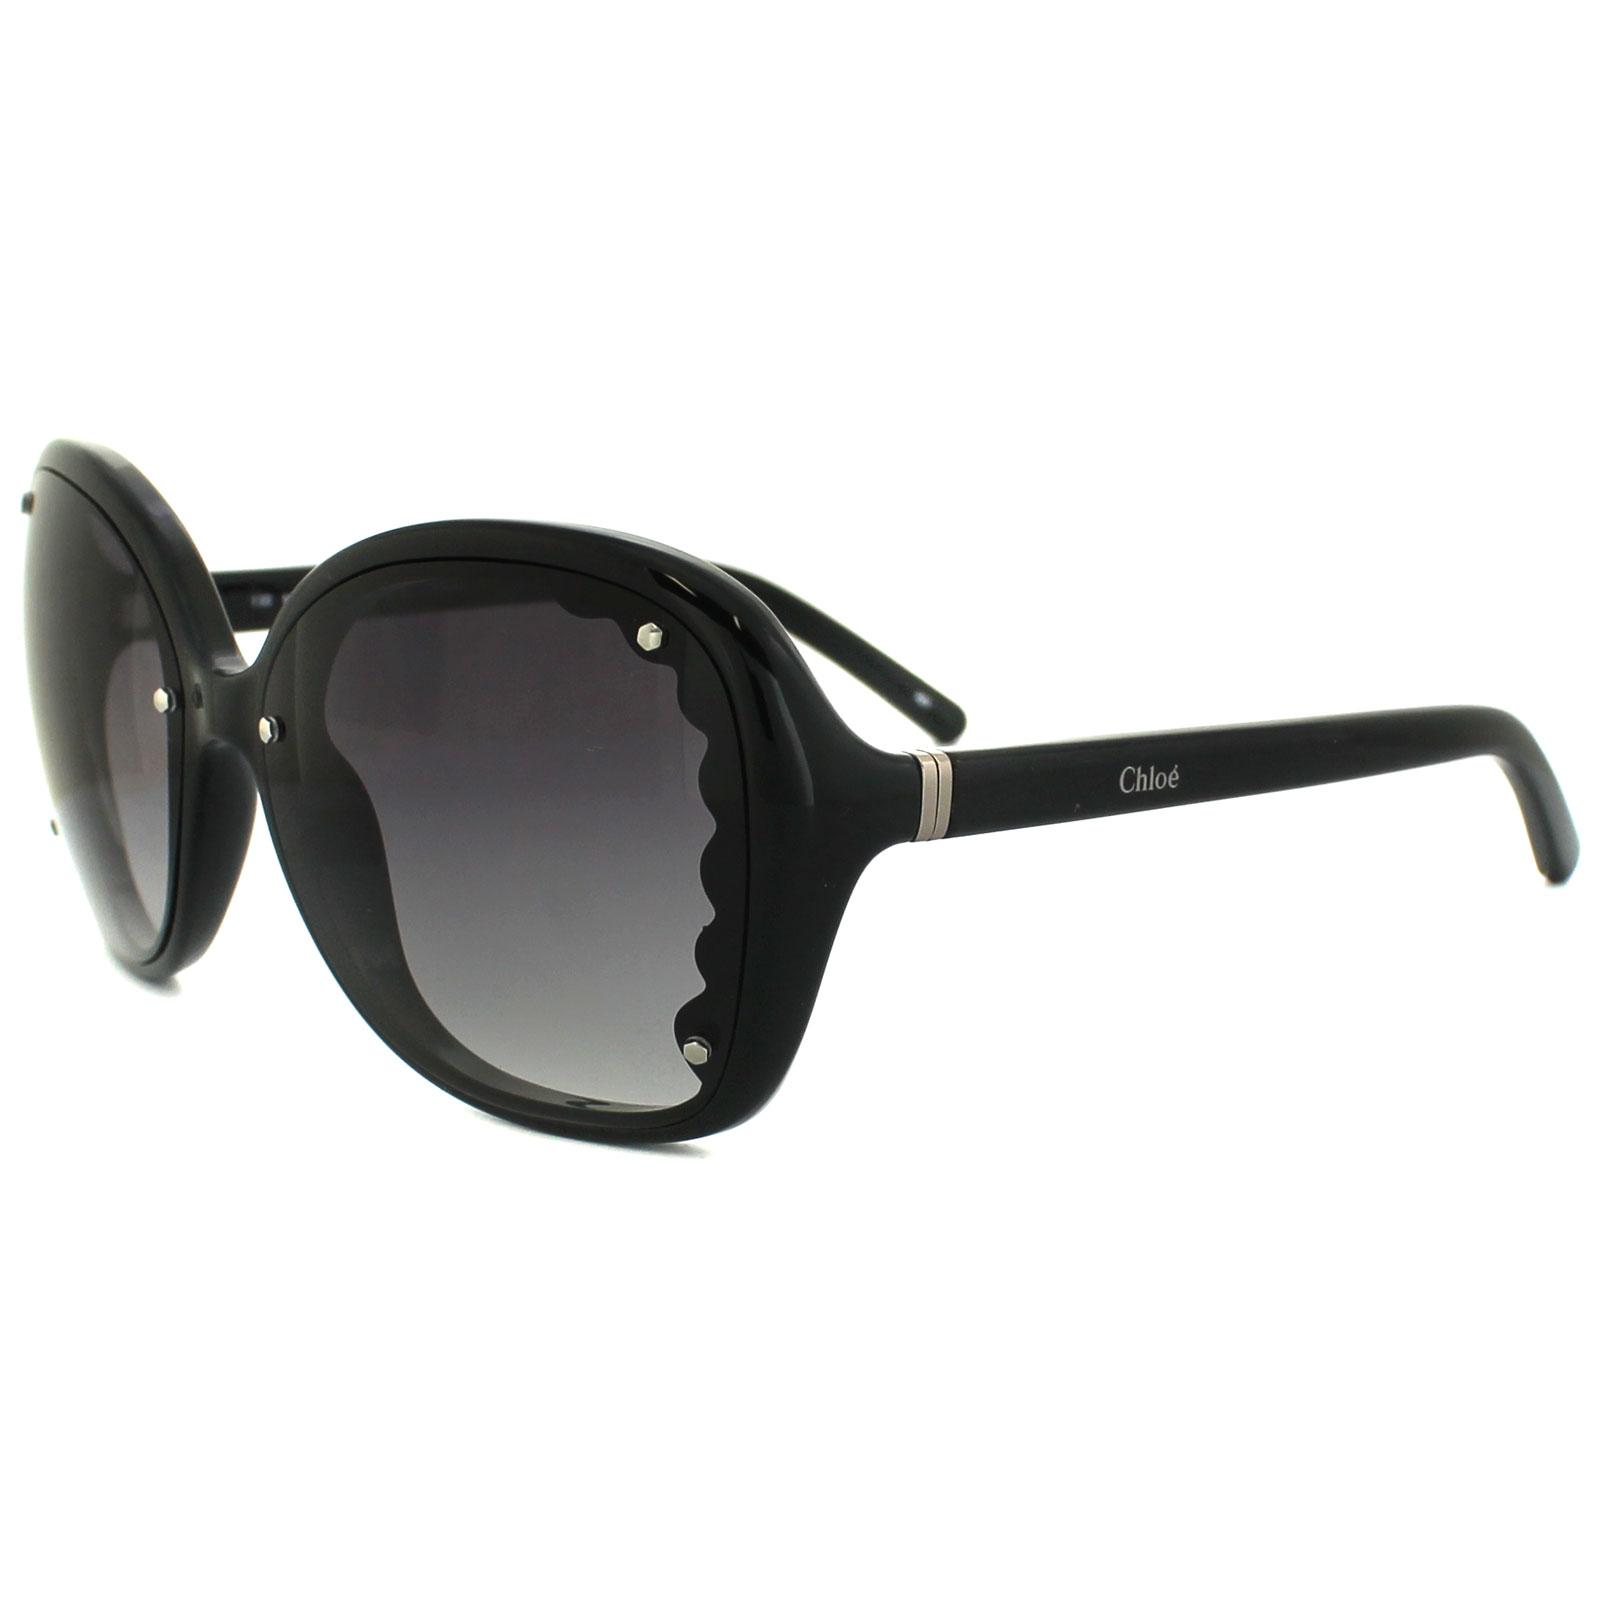 Ce Sunglasses  chloe ce 653s sunglasses ed sunglasses